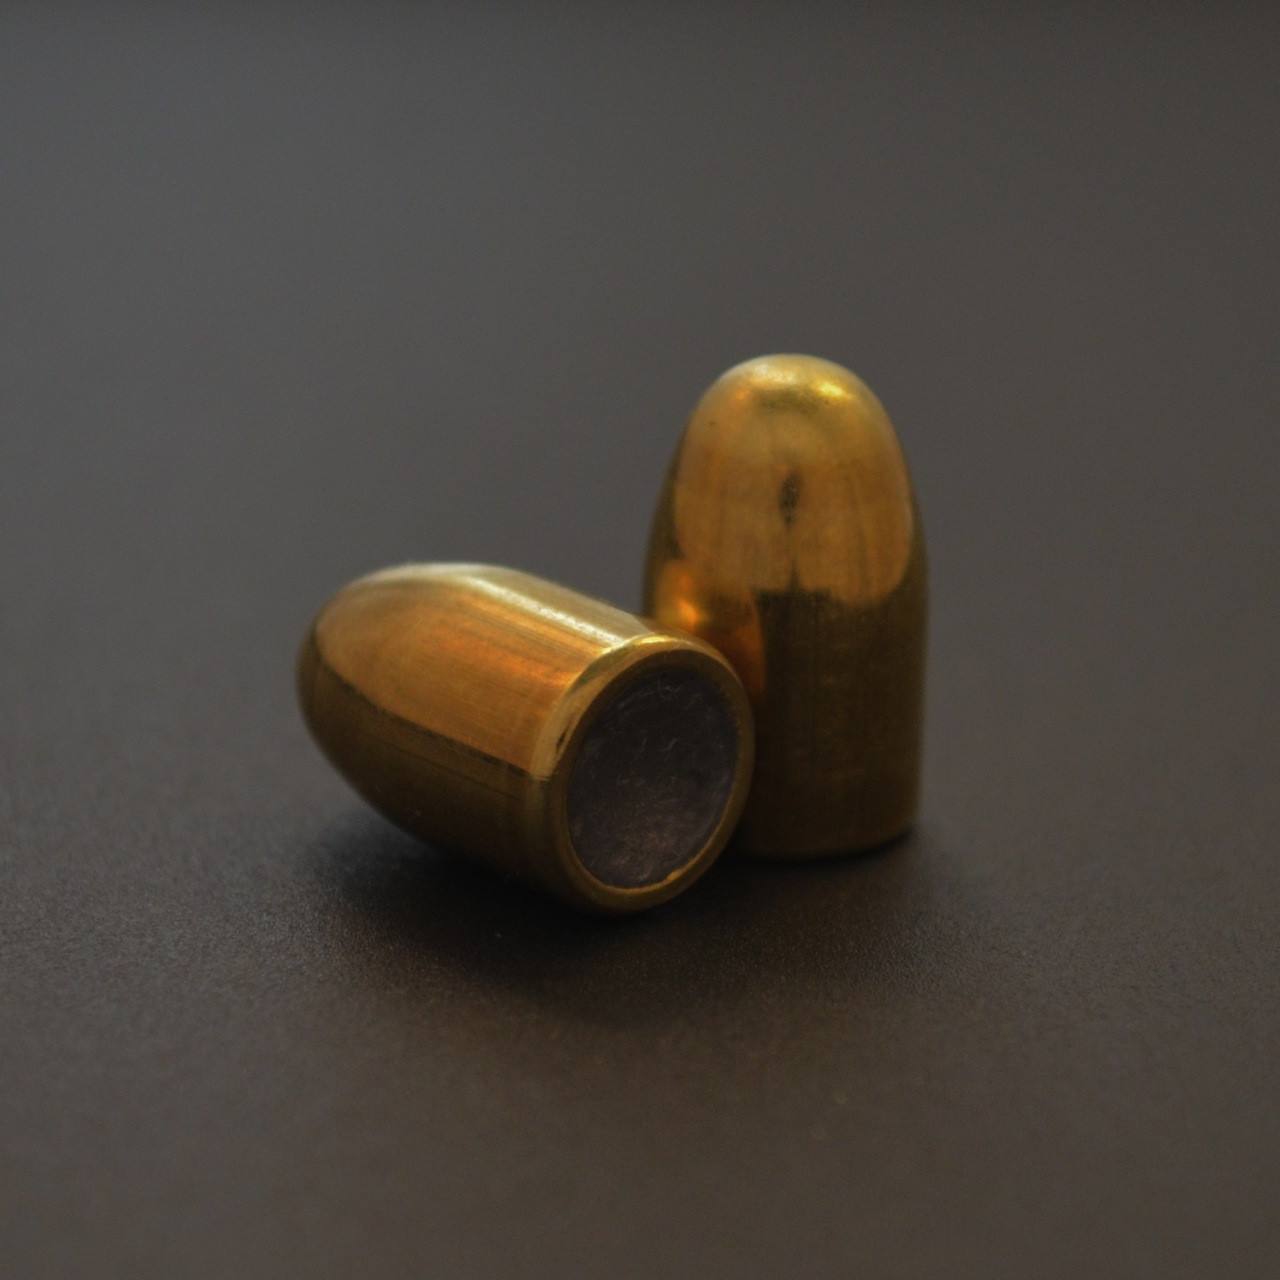 9mm/130gr Super FMJ - 100ct